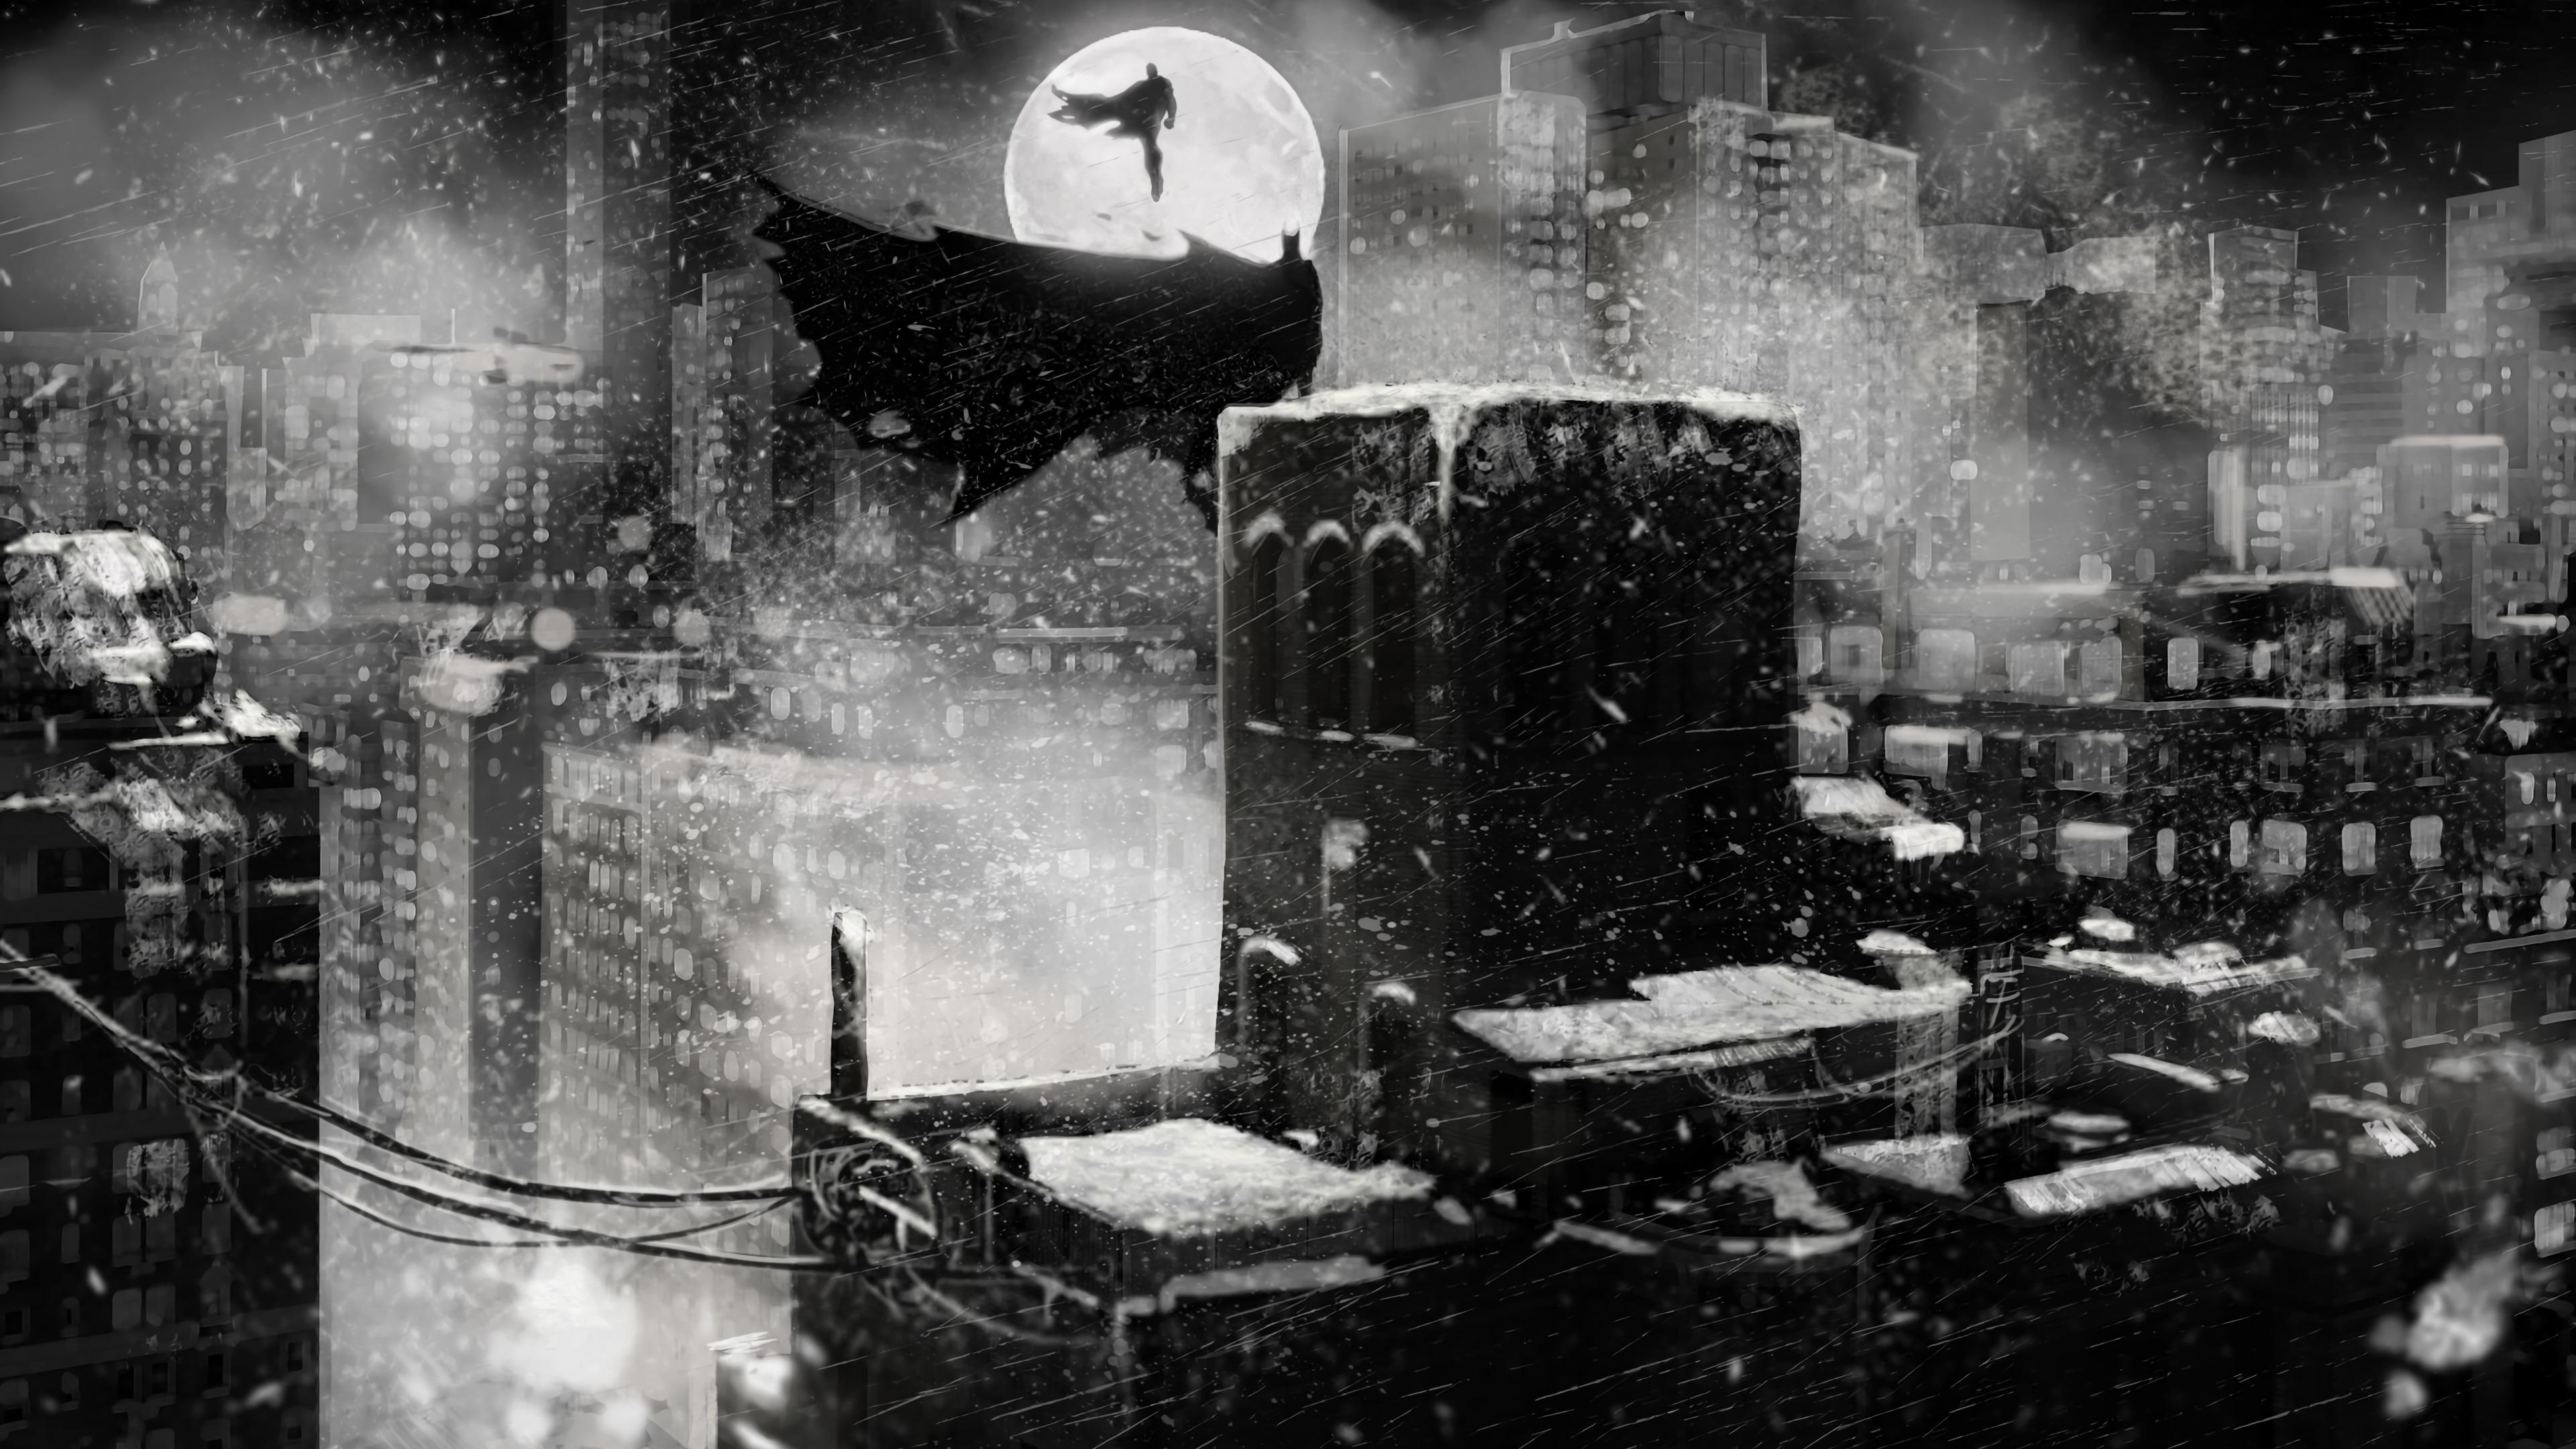 superman batman monochrome 1568054975 - Superman Batman Monochrome - superman wallpapers, superheroes wallpapers, monochrome wallpapers, hd-wallpapers, digital art wallpapers, batman wallpapers, artwork wallpapers, artstation wallpapers, 4k-wallpapers